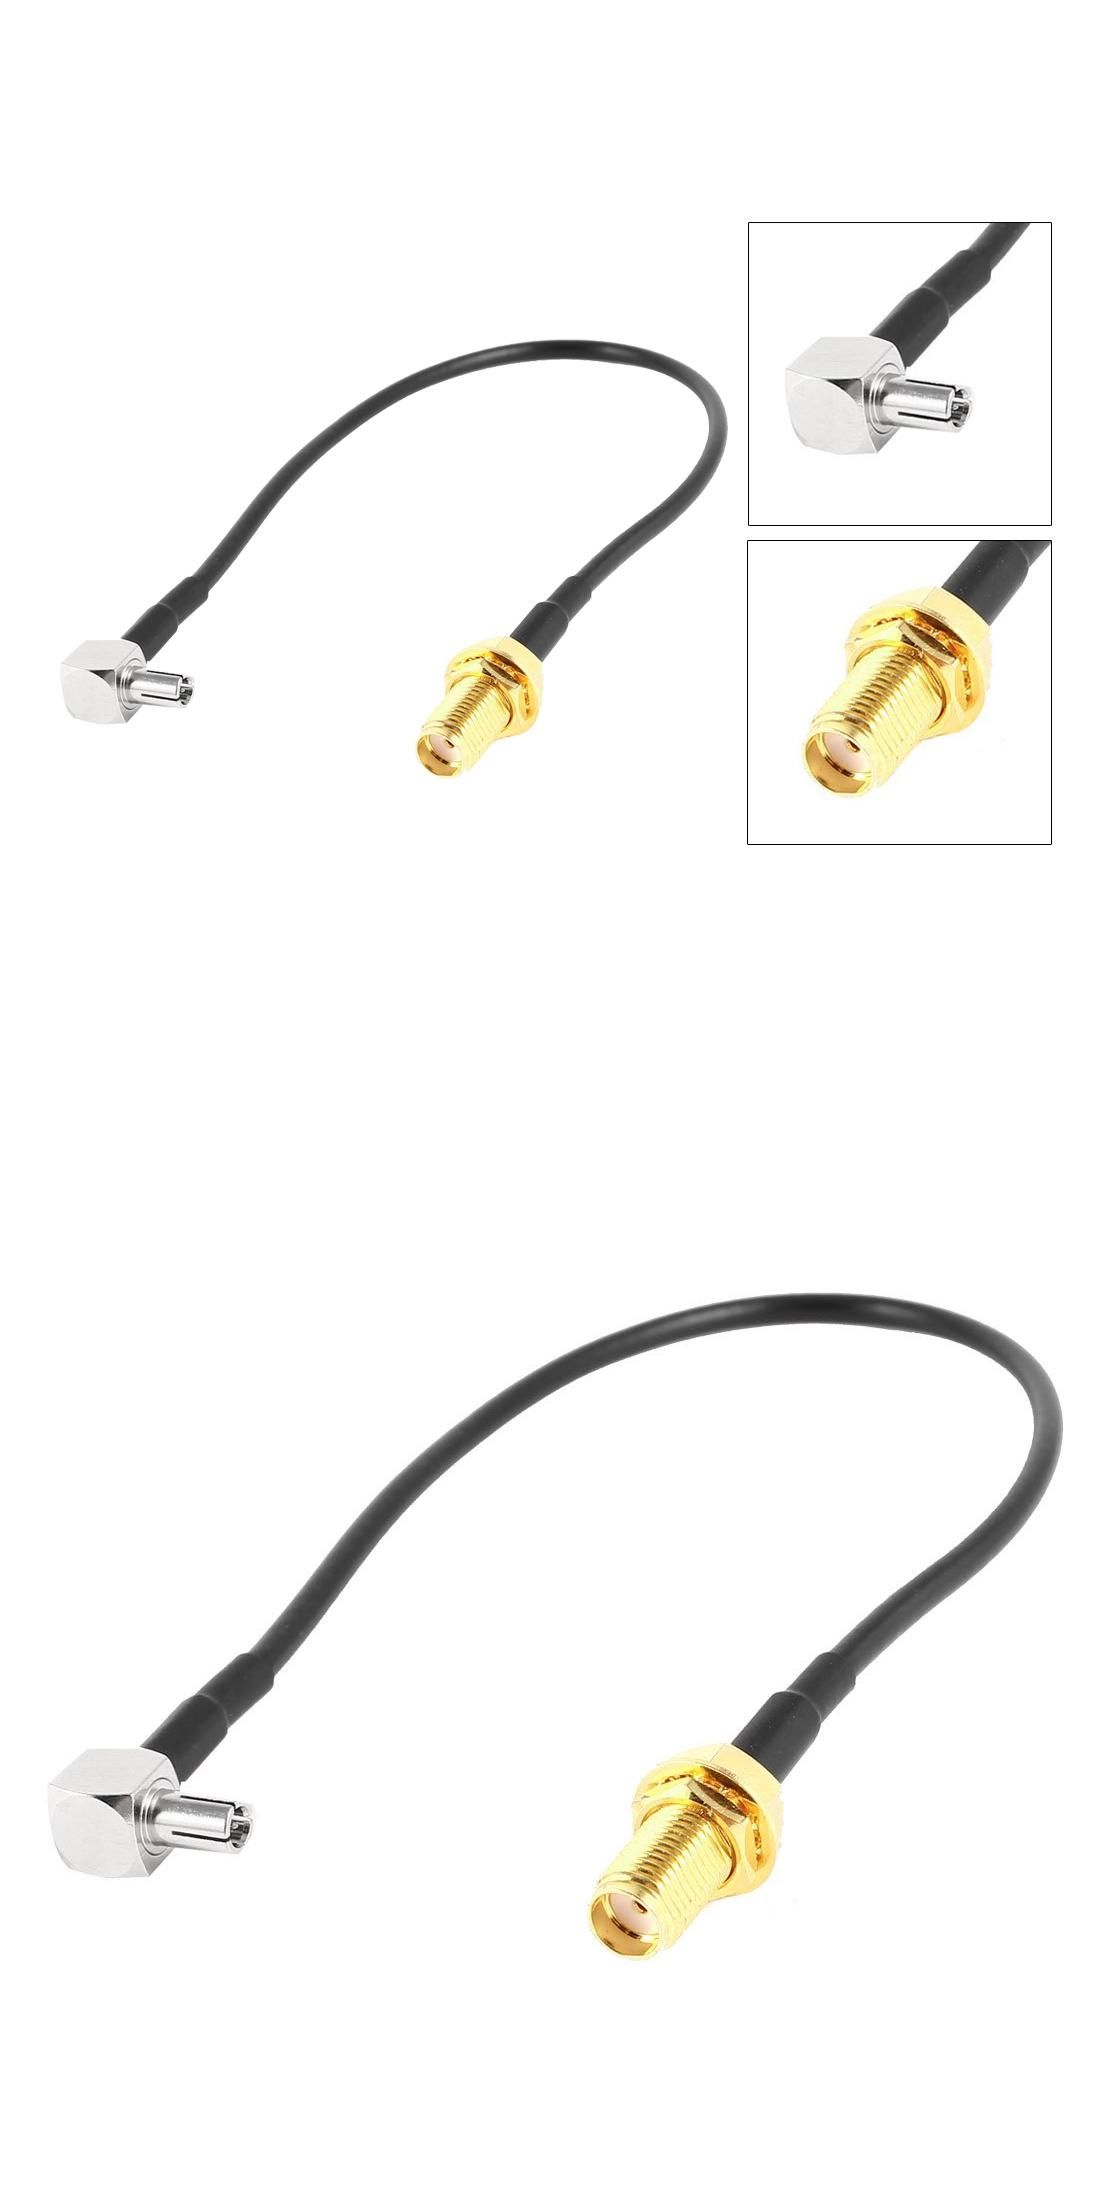 Rp Sma Male Rg316 15 Pigtail Ufl N Female Electrical Equipment Supplies Pinterest